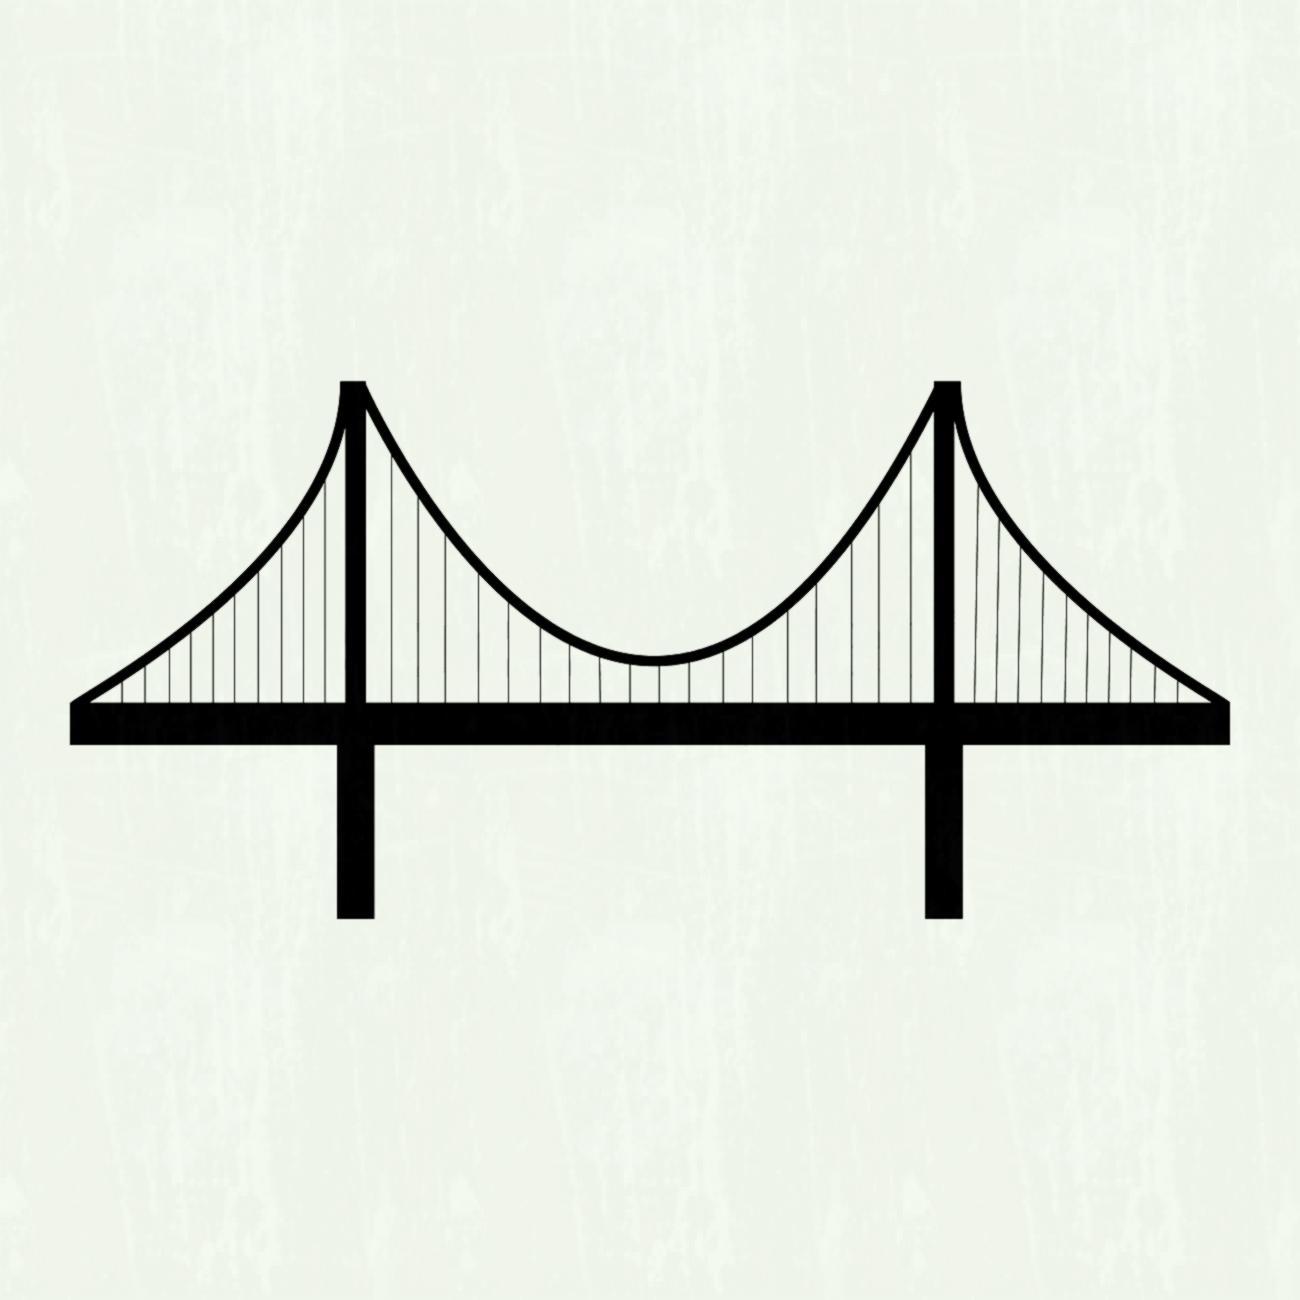 1300x1300 Golden Gate Bridge Vector Image Picturesque Clipart